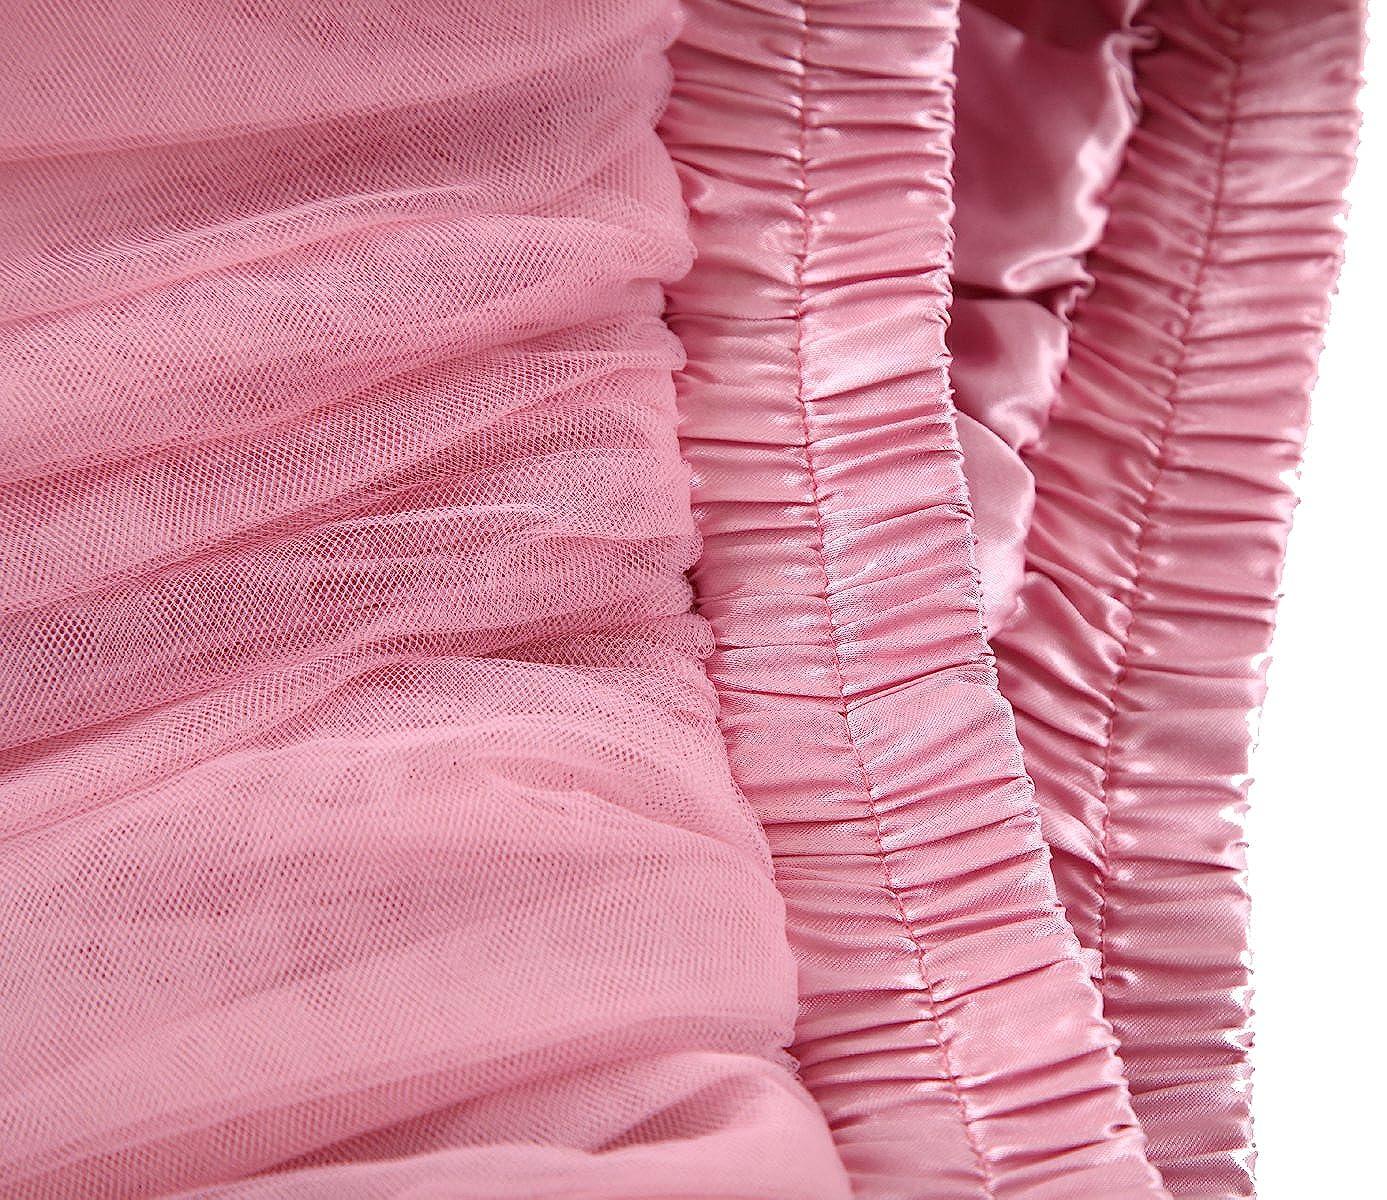 Allenqueen Pleated Above Knee Skirt Parent-Child Petticoat High Waist Tutu Tulle Skirt